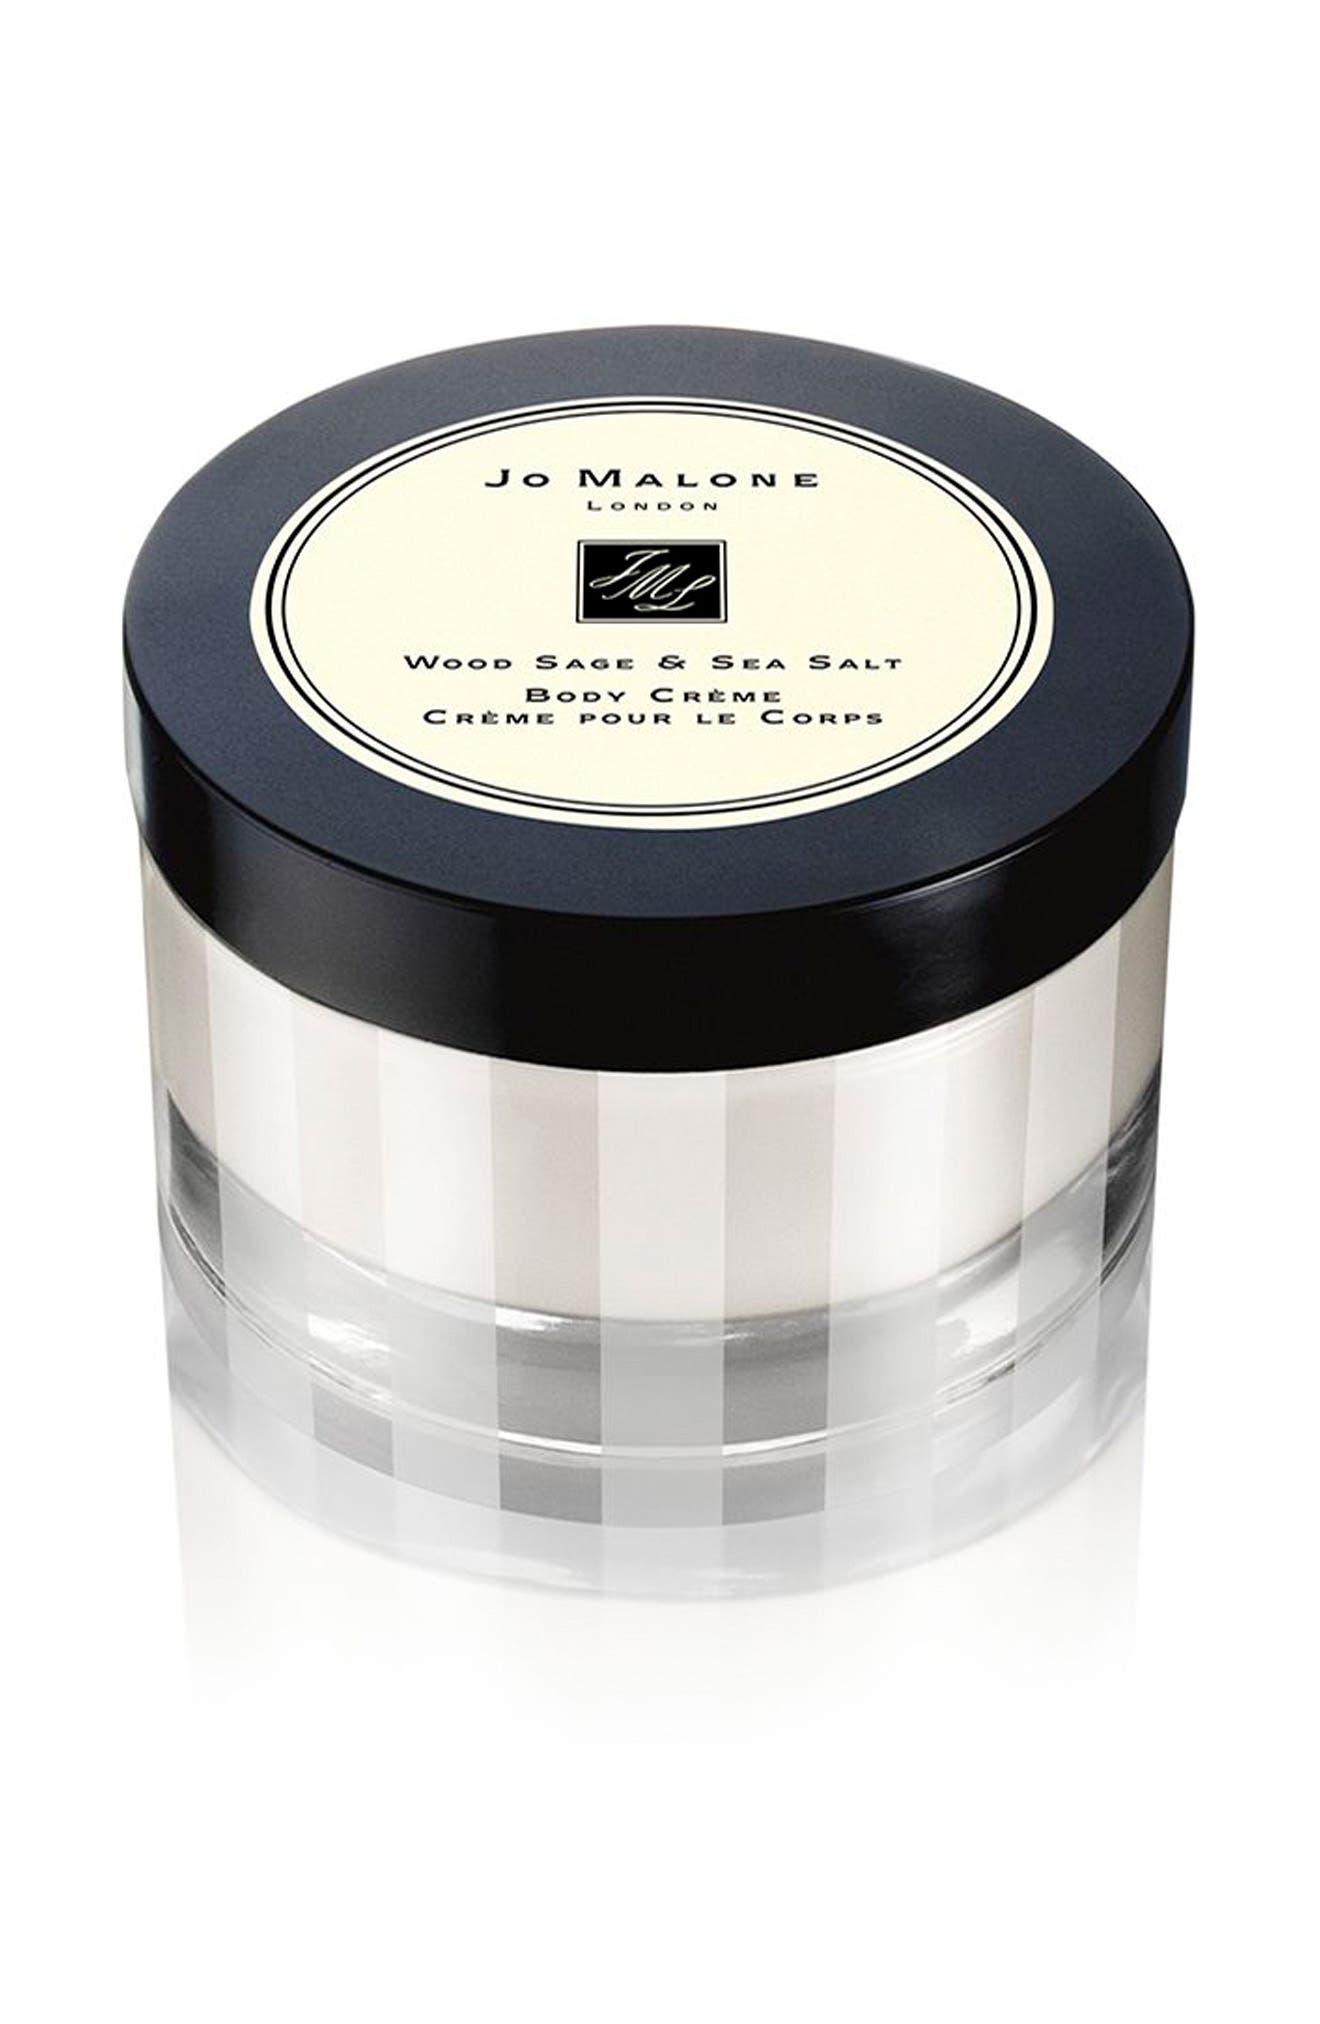 Jo Malone London(TM) Wood Sage & Sea Salt Body Creme